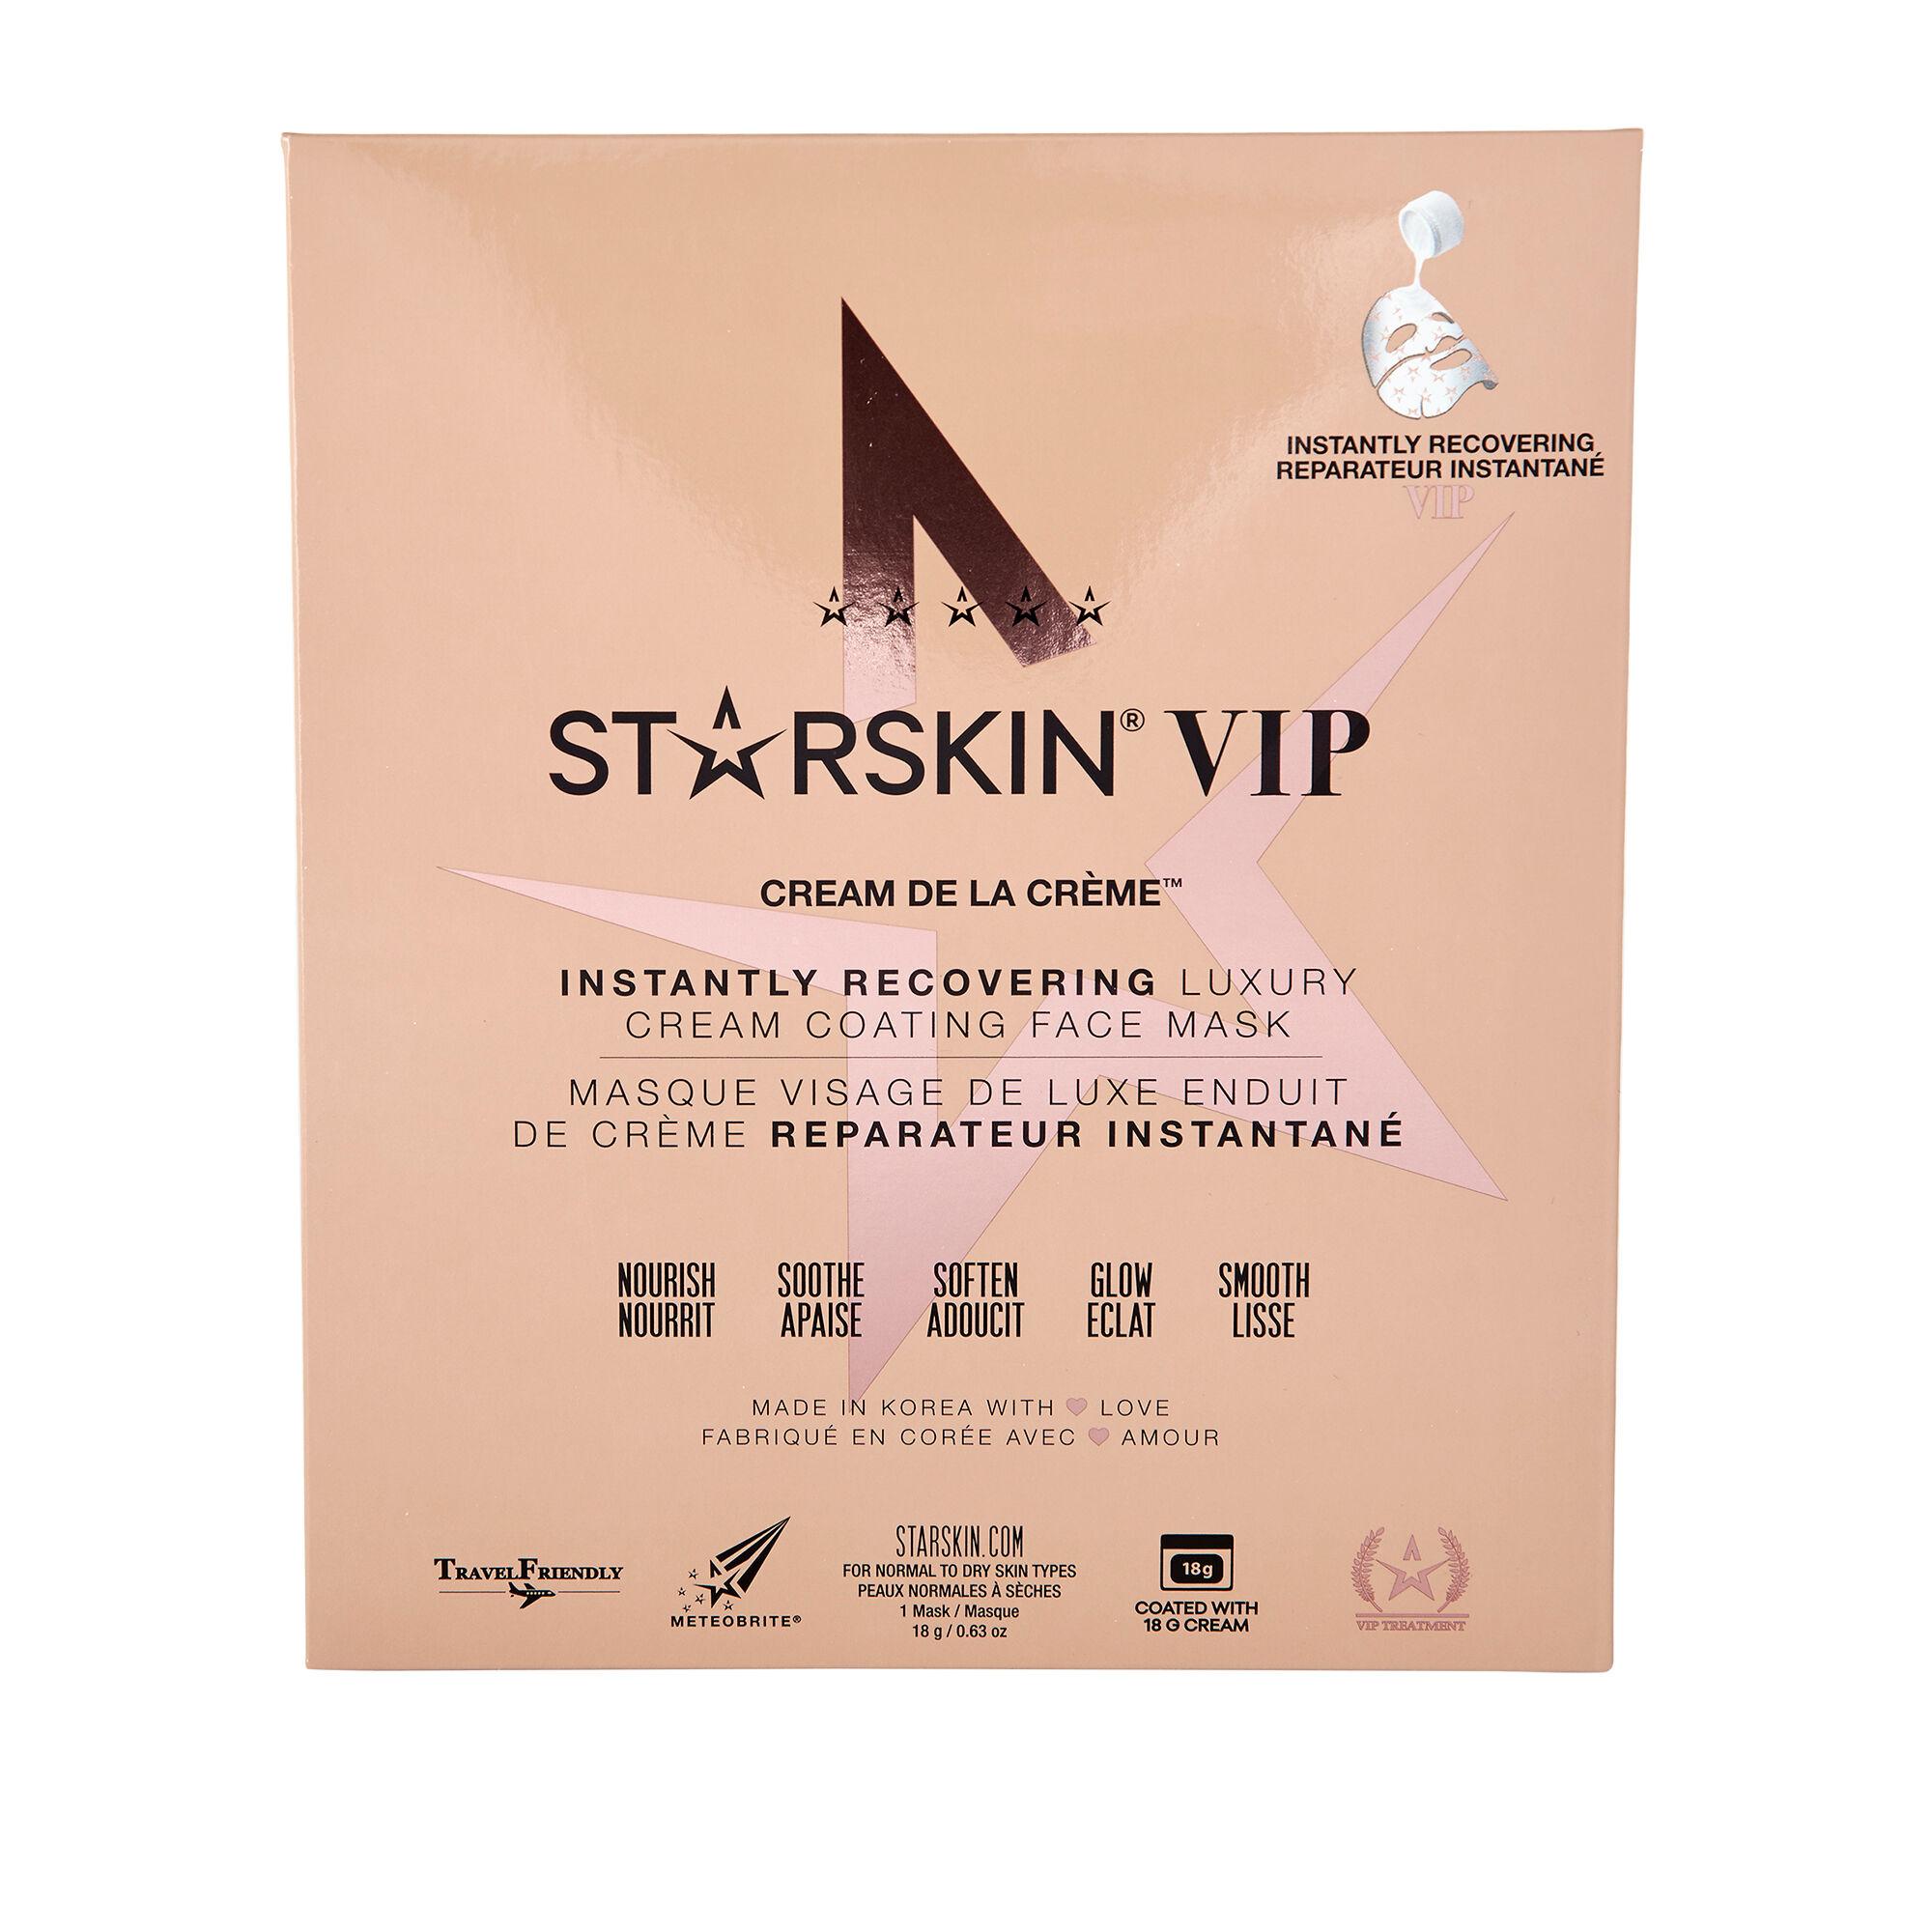 STARSKIN Cream de la Creme Instantly Recovering Luxury Cream Coating Face Mask